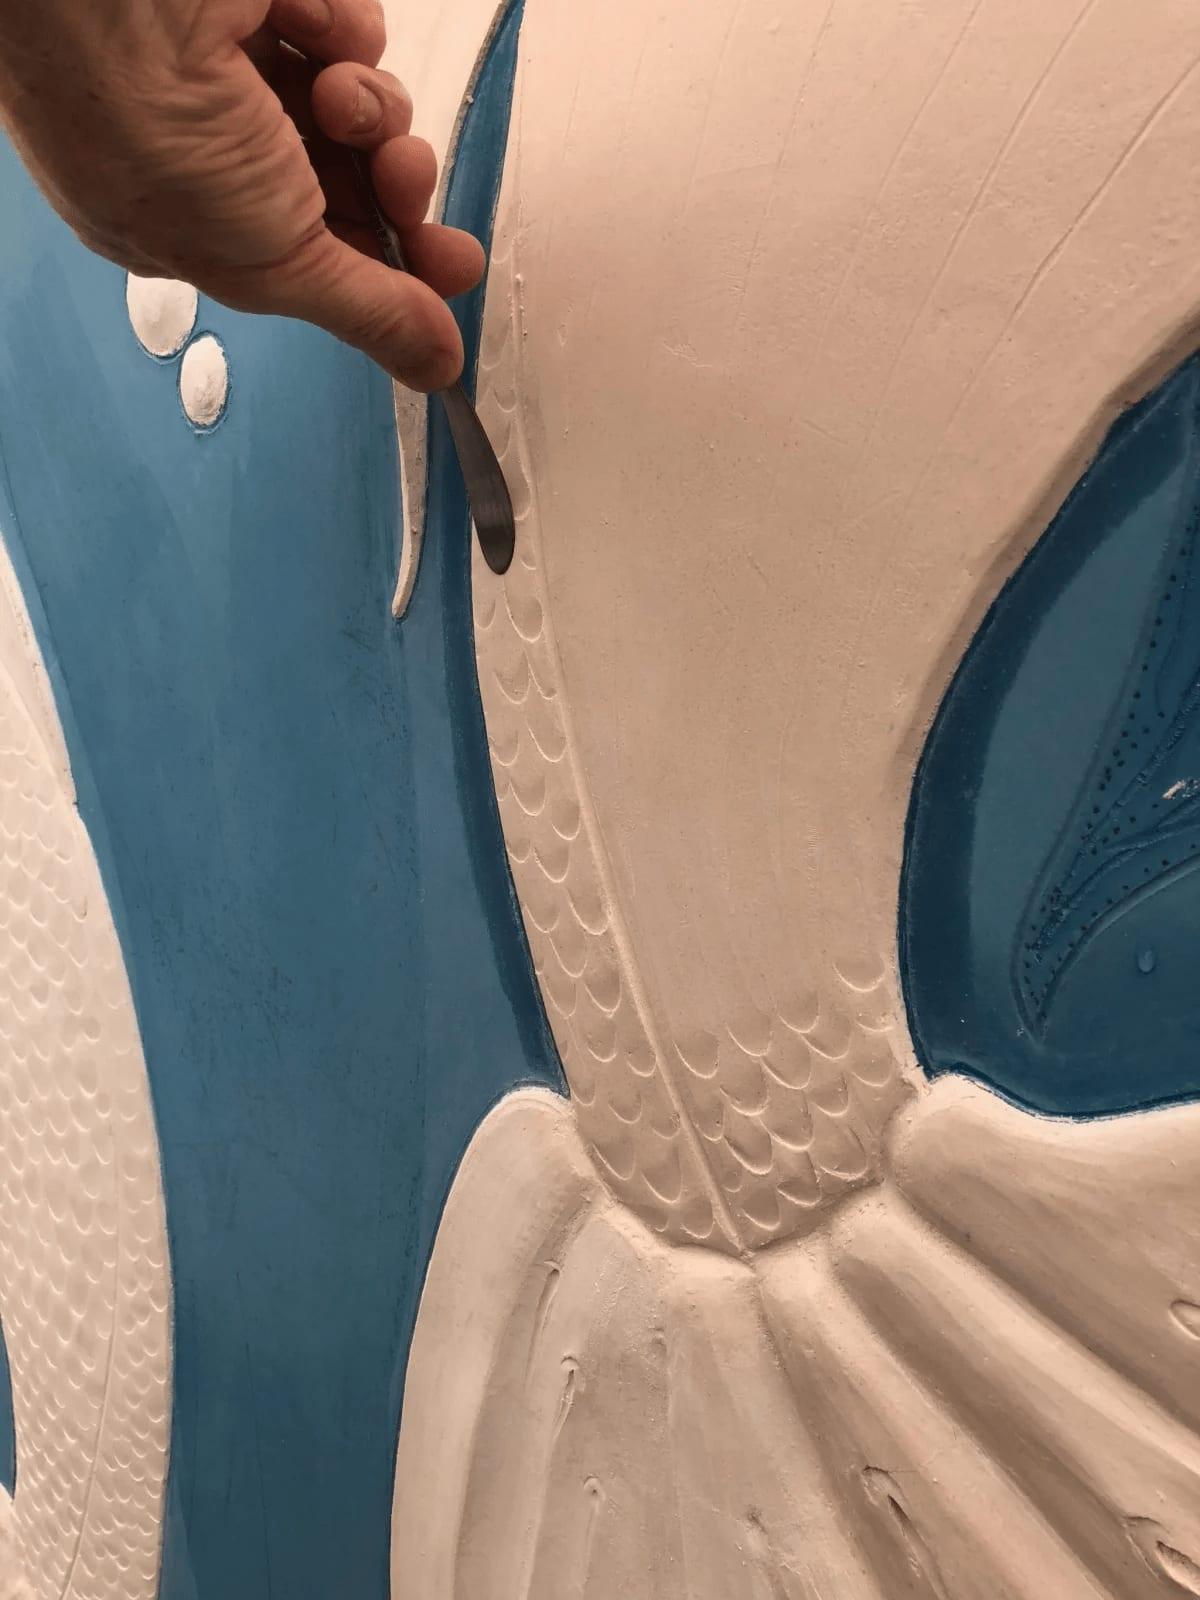 bas-relief-sculpture-marmorino-sculpting-decorex-2018-pigmentti